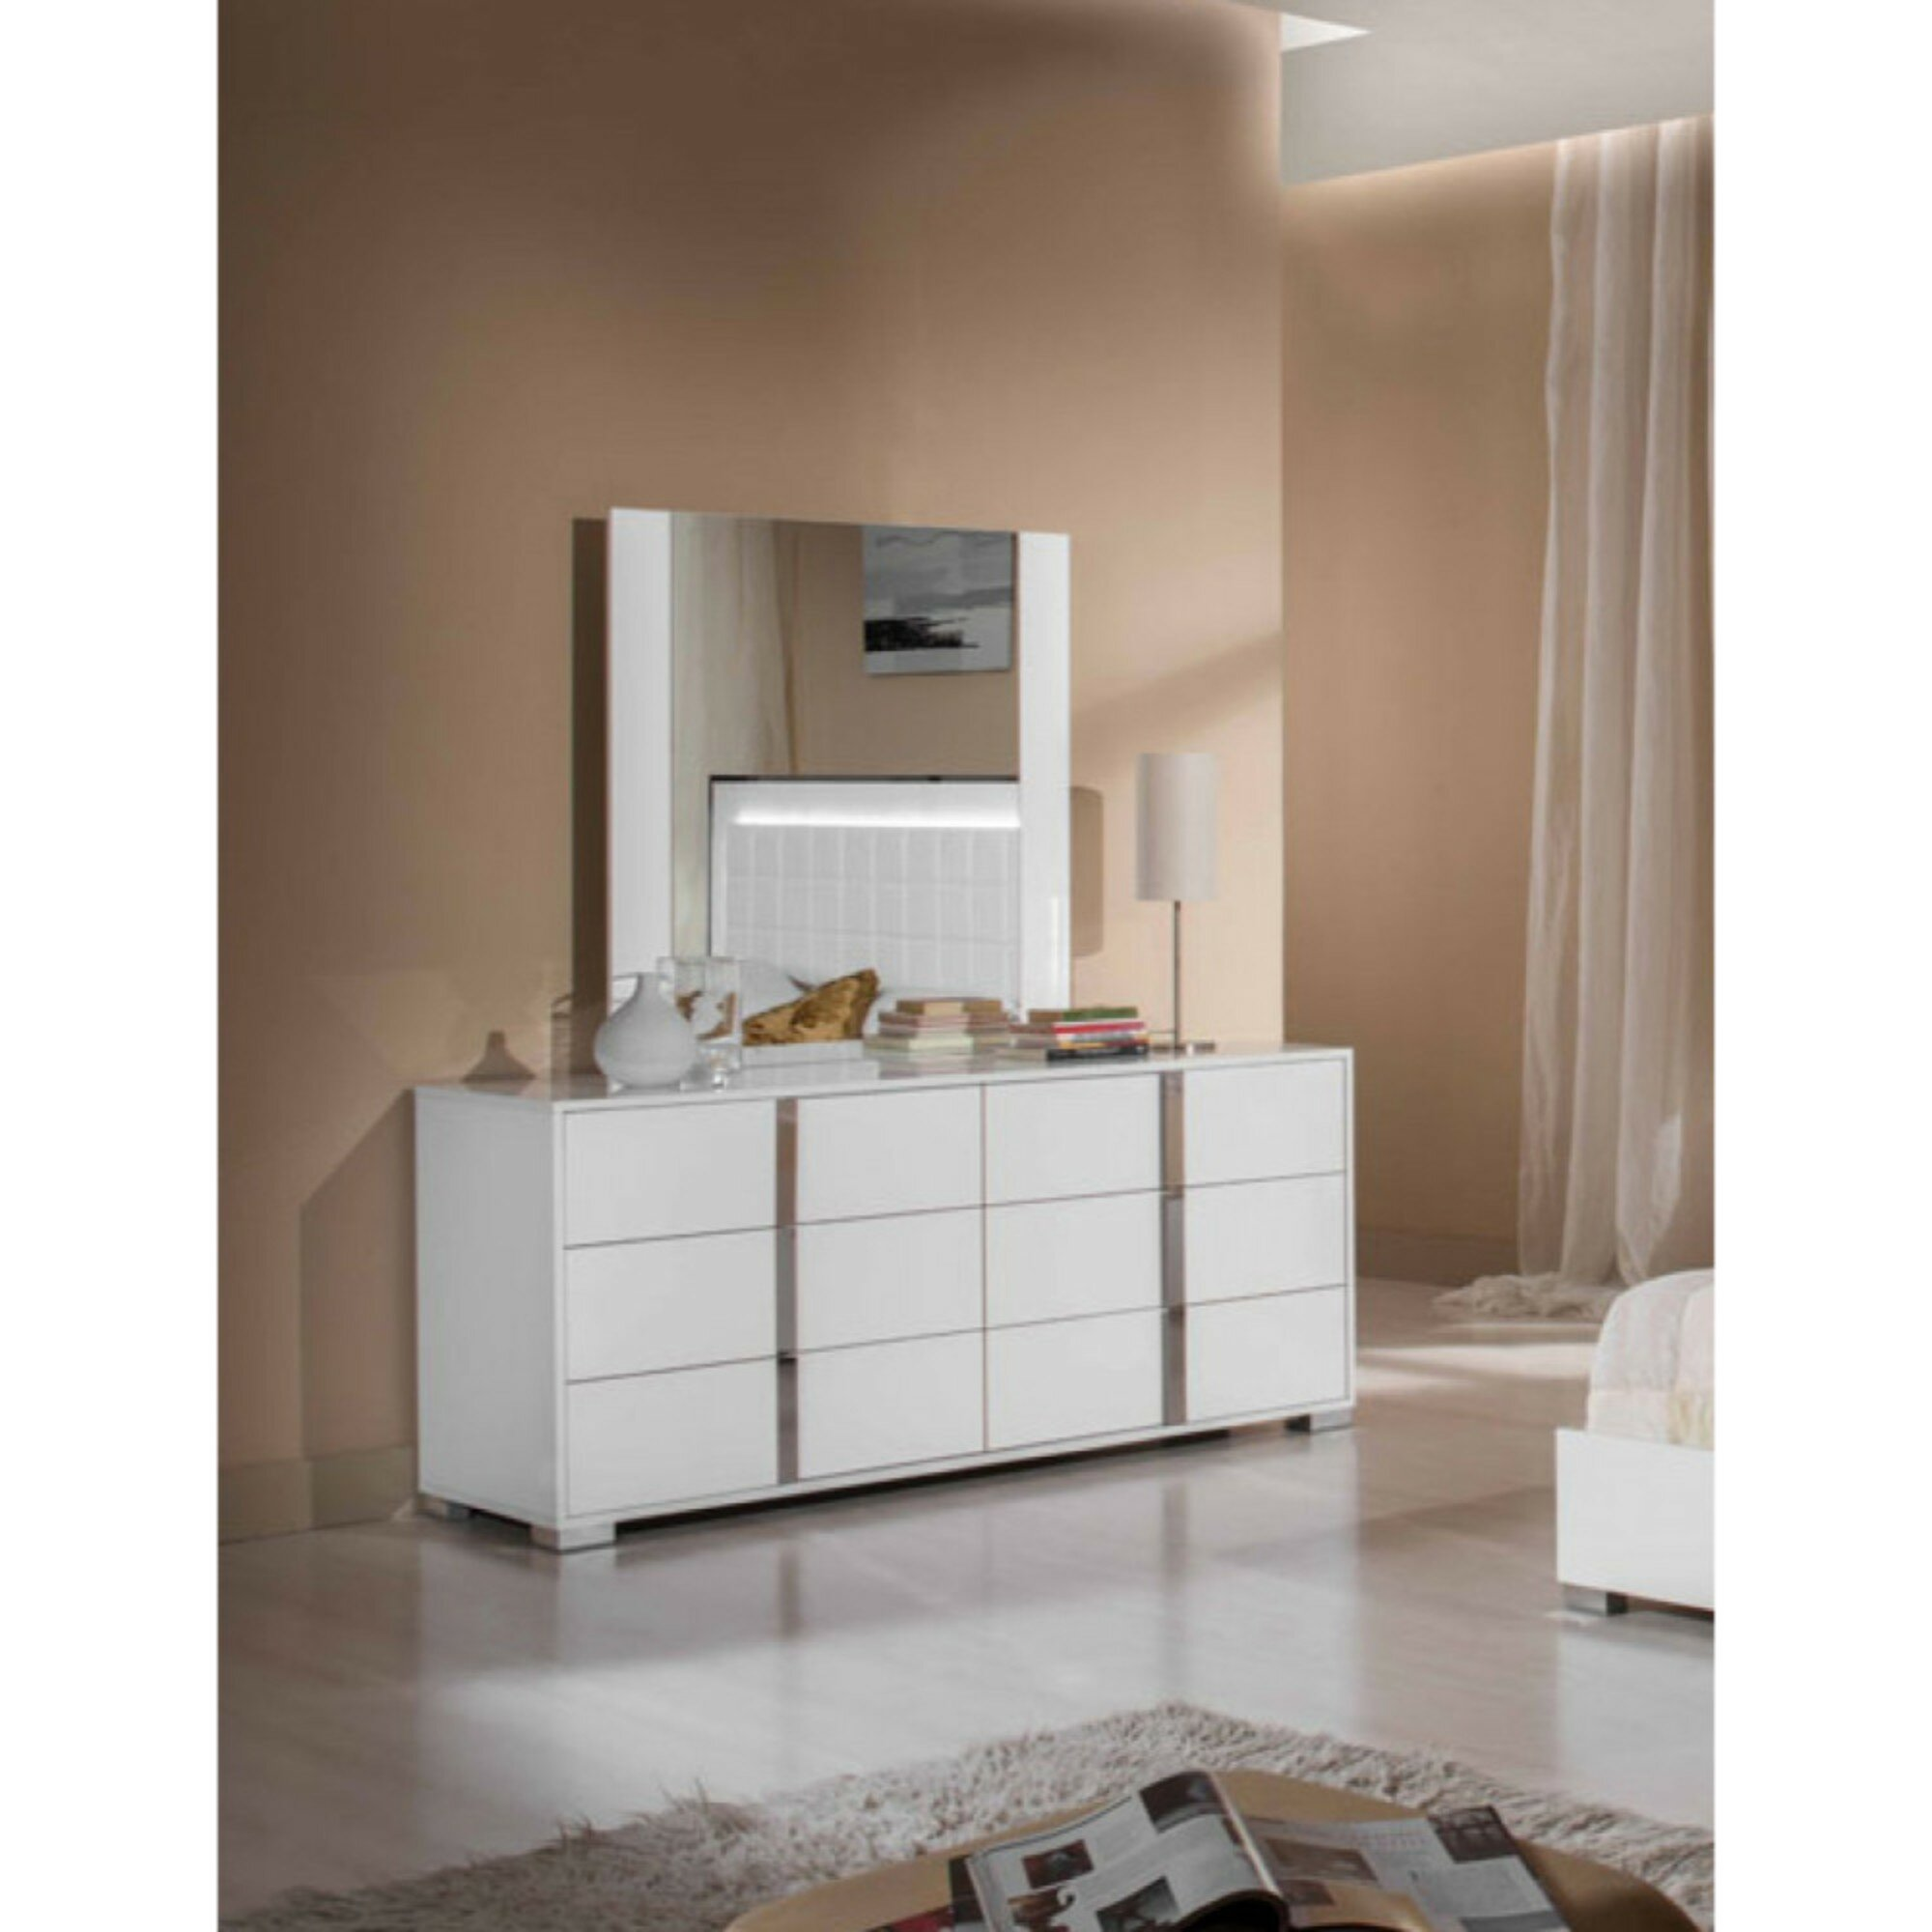 Orren ellis desai modern wooden 6 drawer double dresser wayfair ca